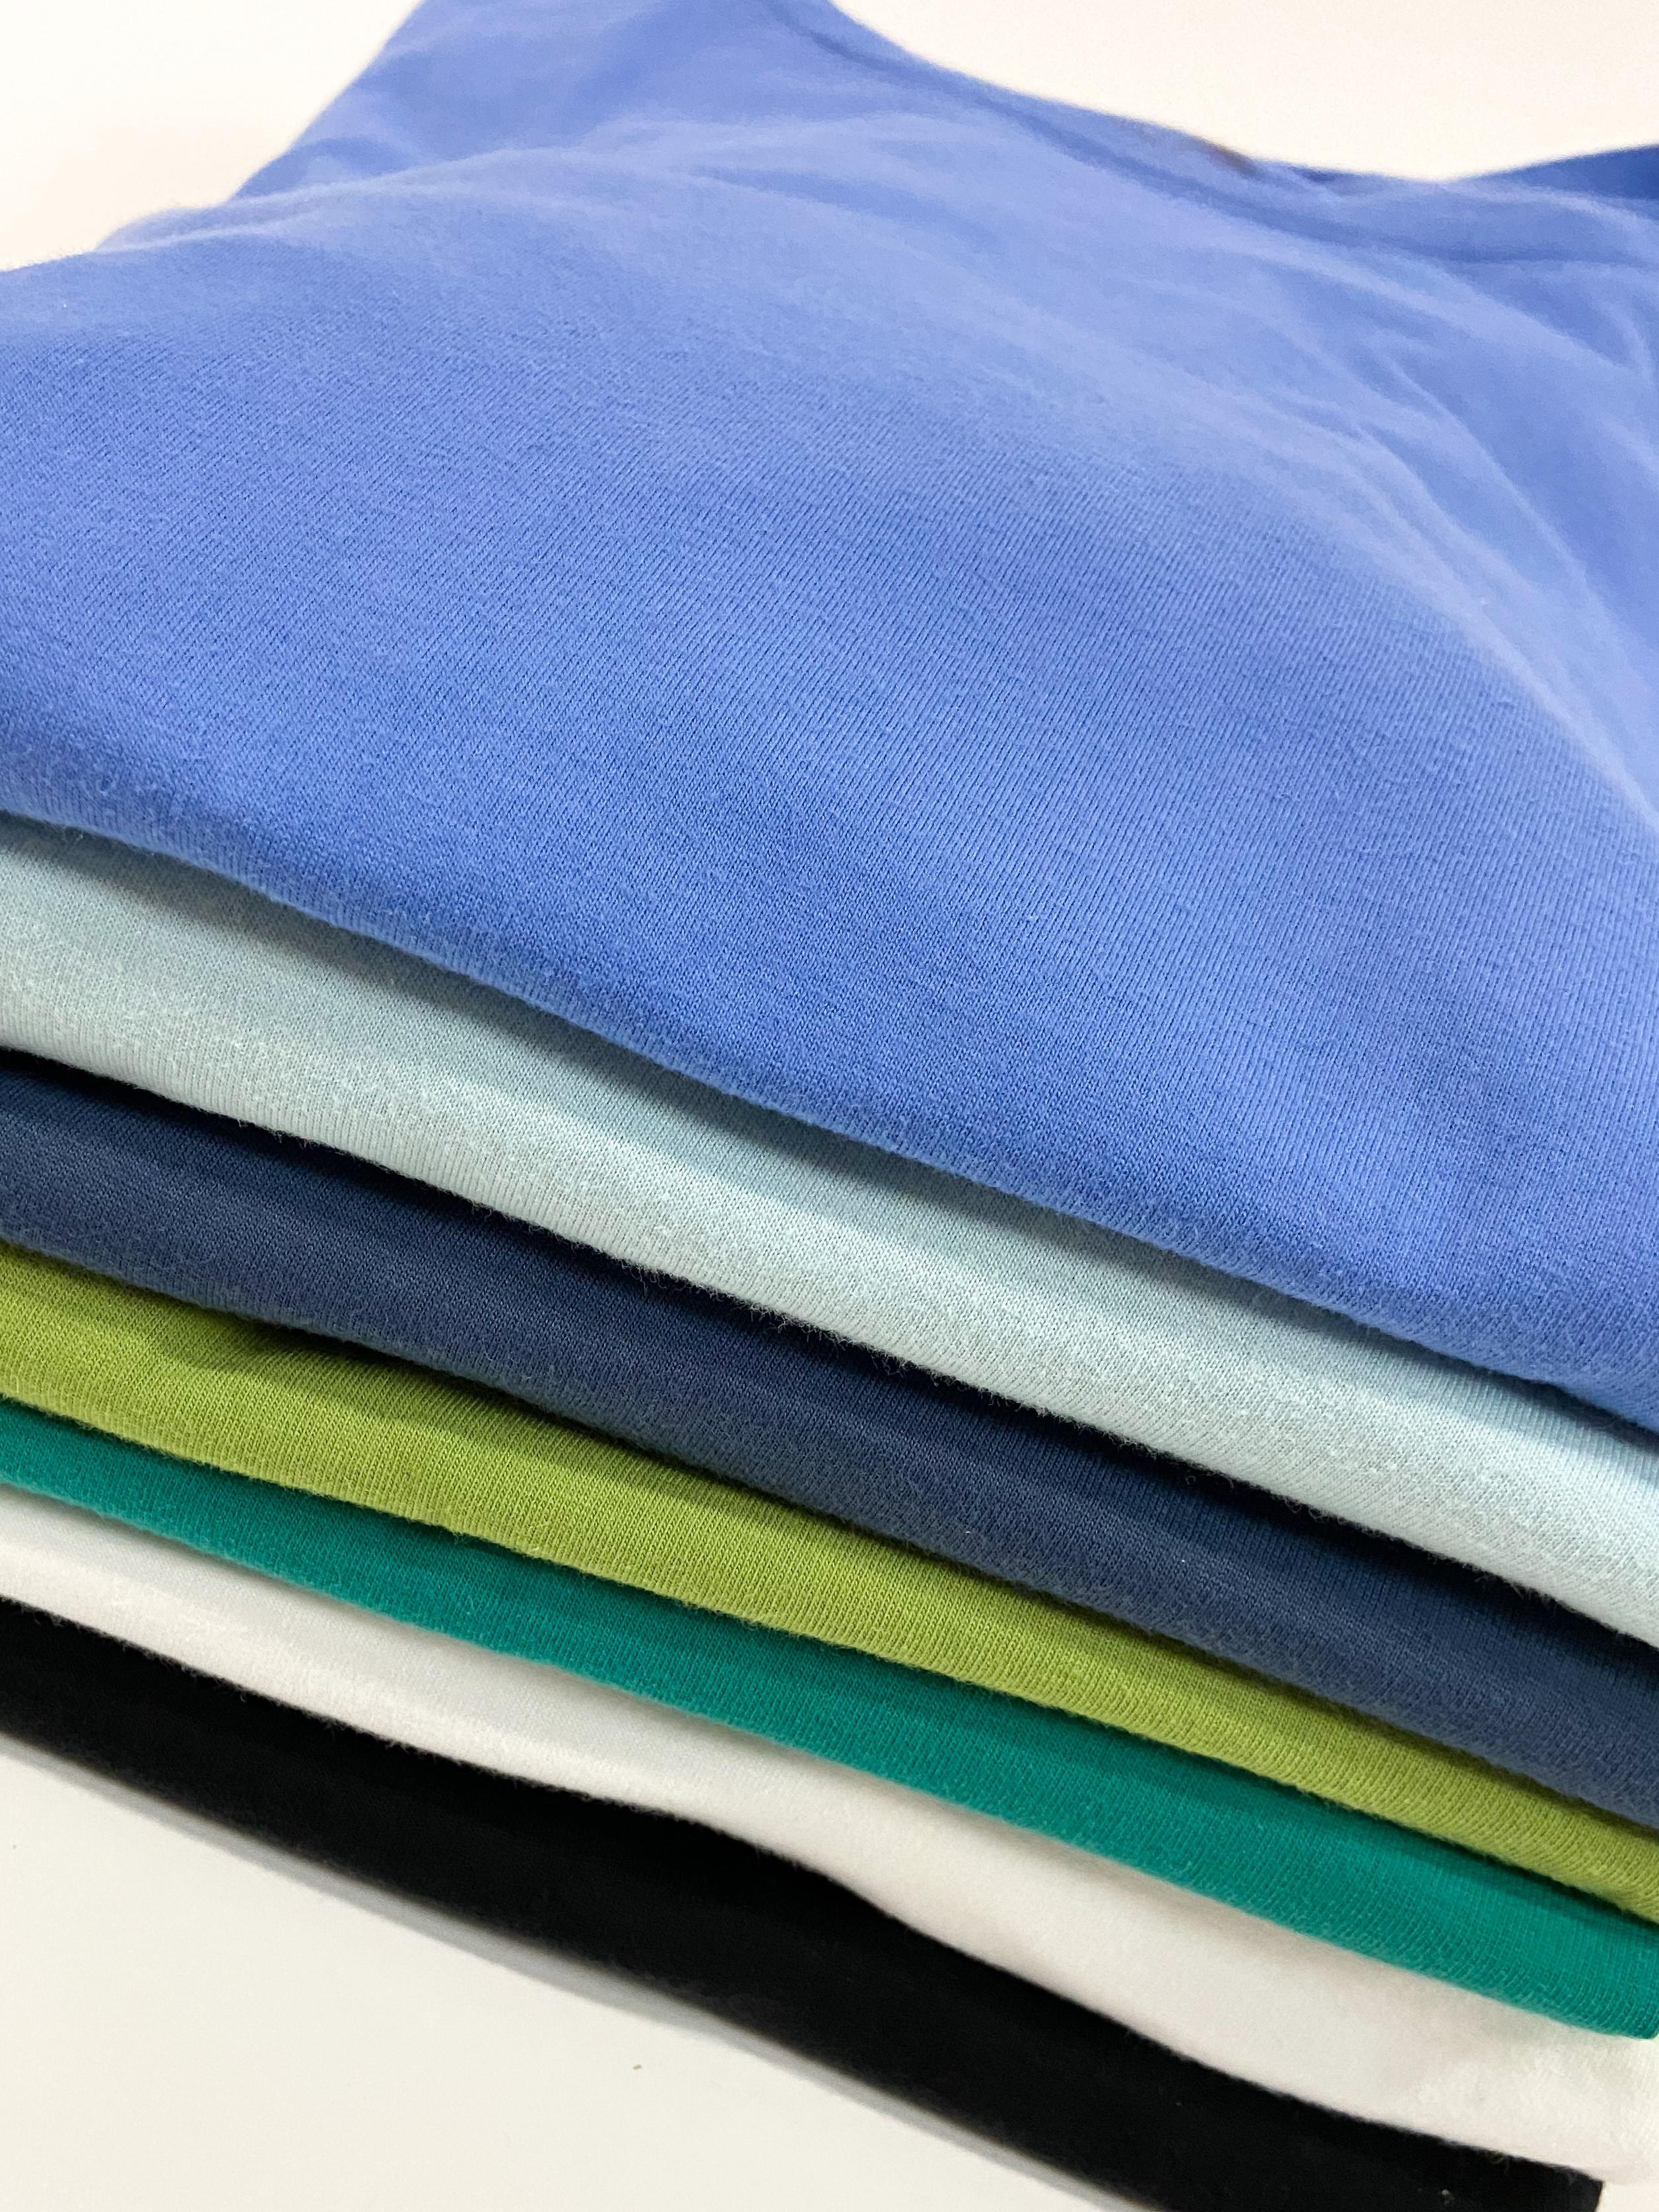 stack-of-shirts.jpg